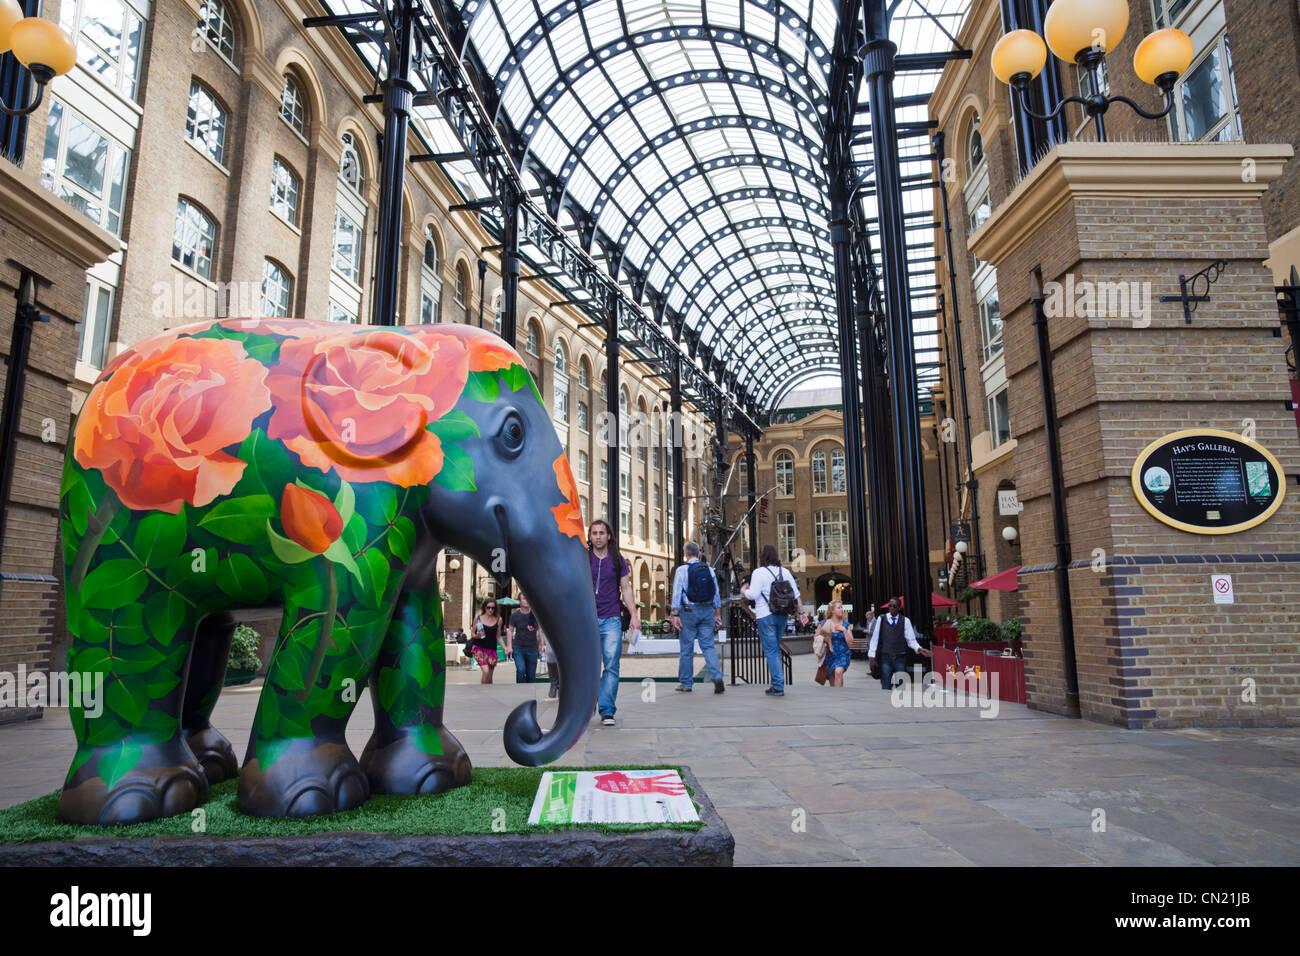 Elephant at Hay's Galleria, London, UK - Stock Image